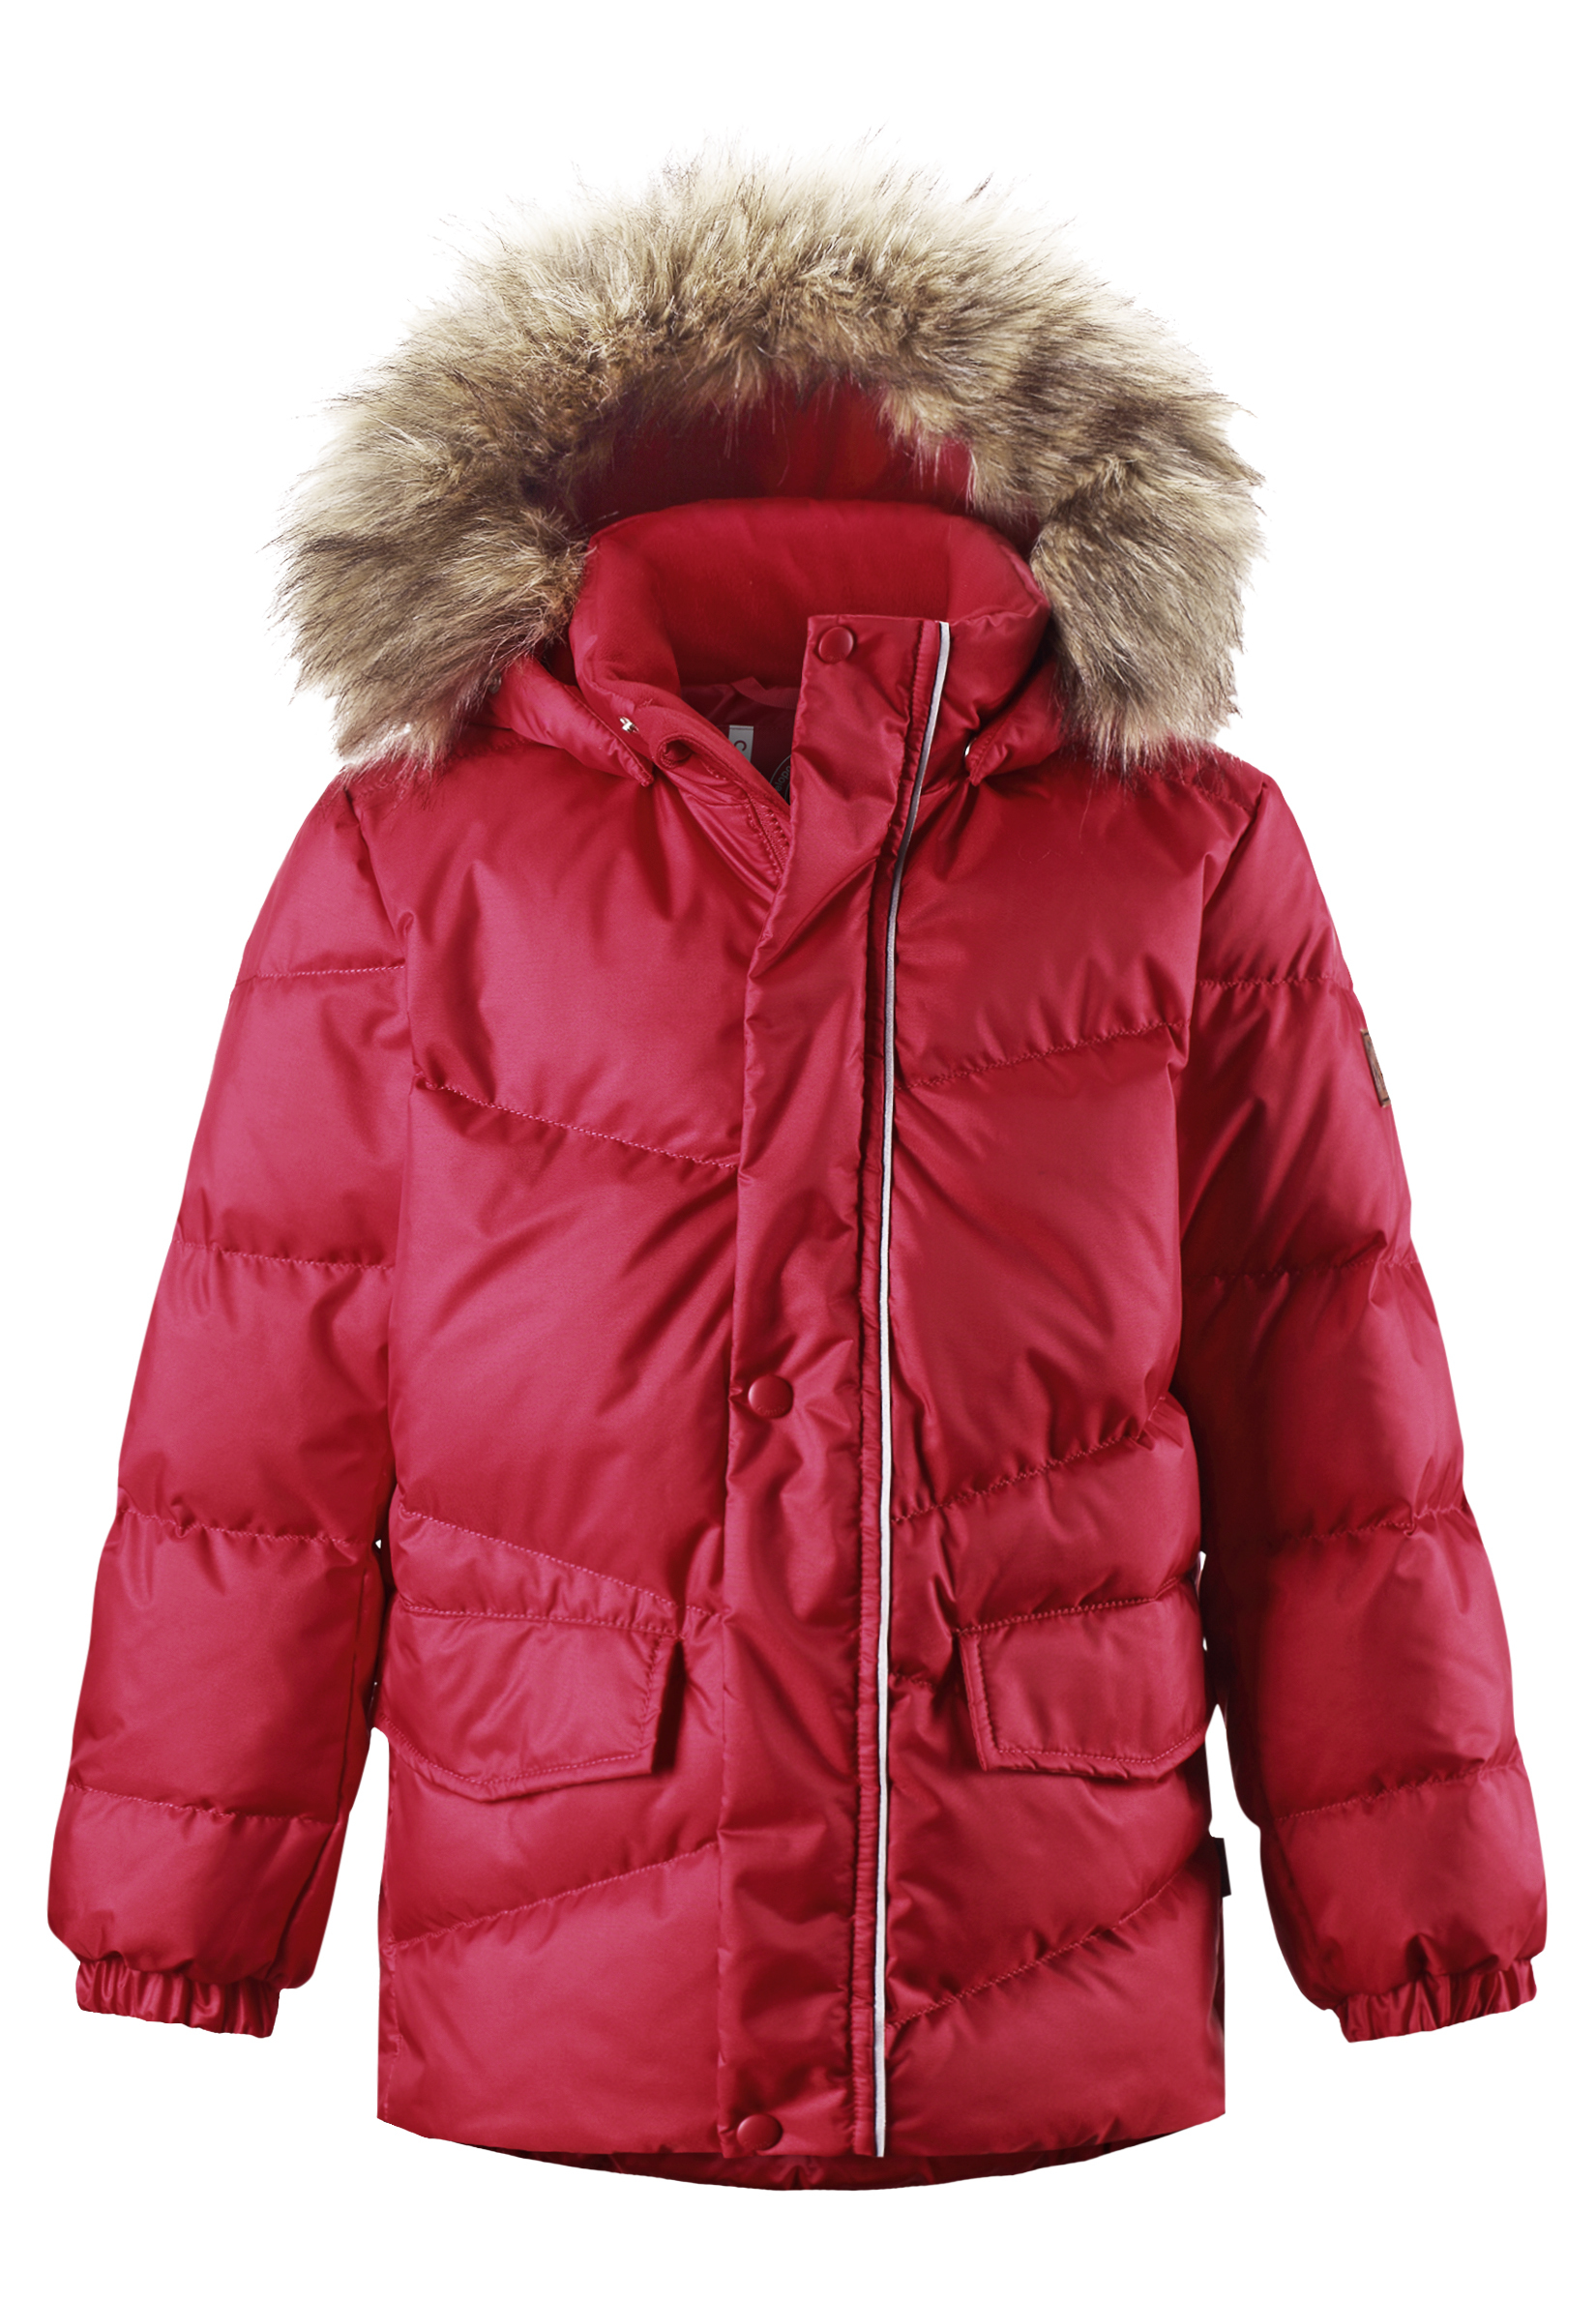 053413d1afd 531229-3830 Pause Куртка Reima.